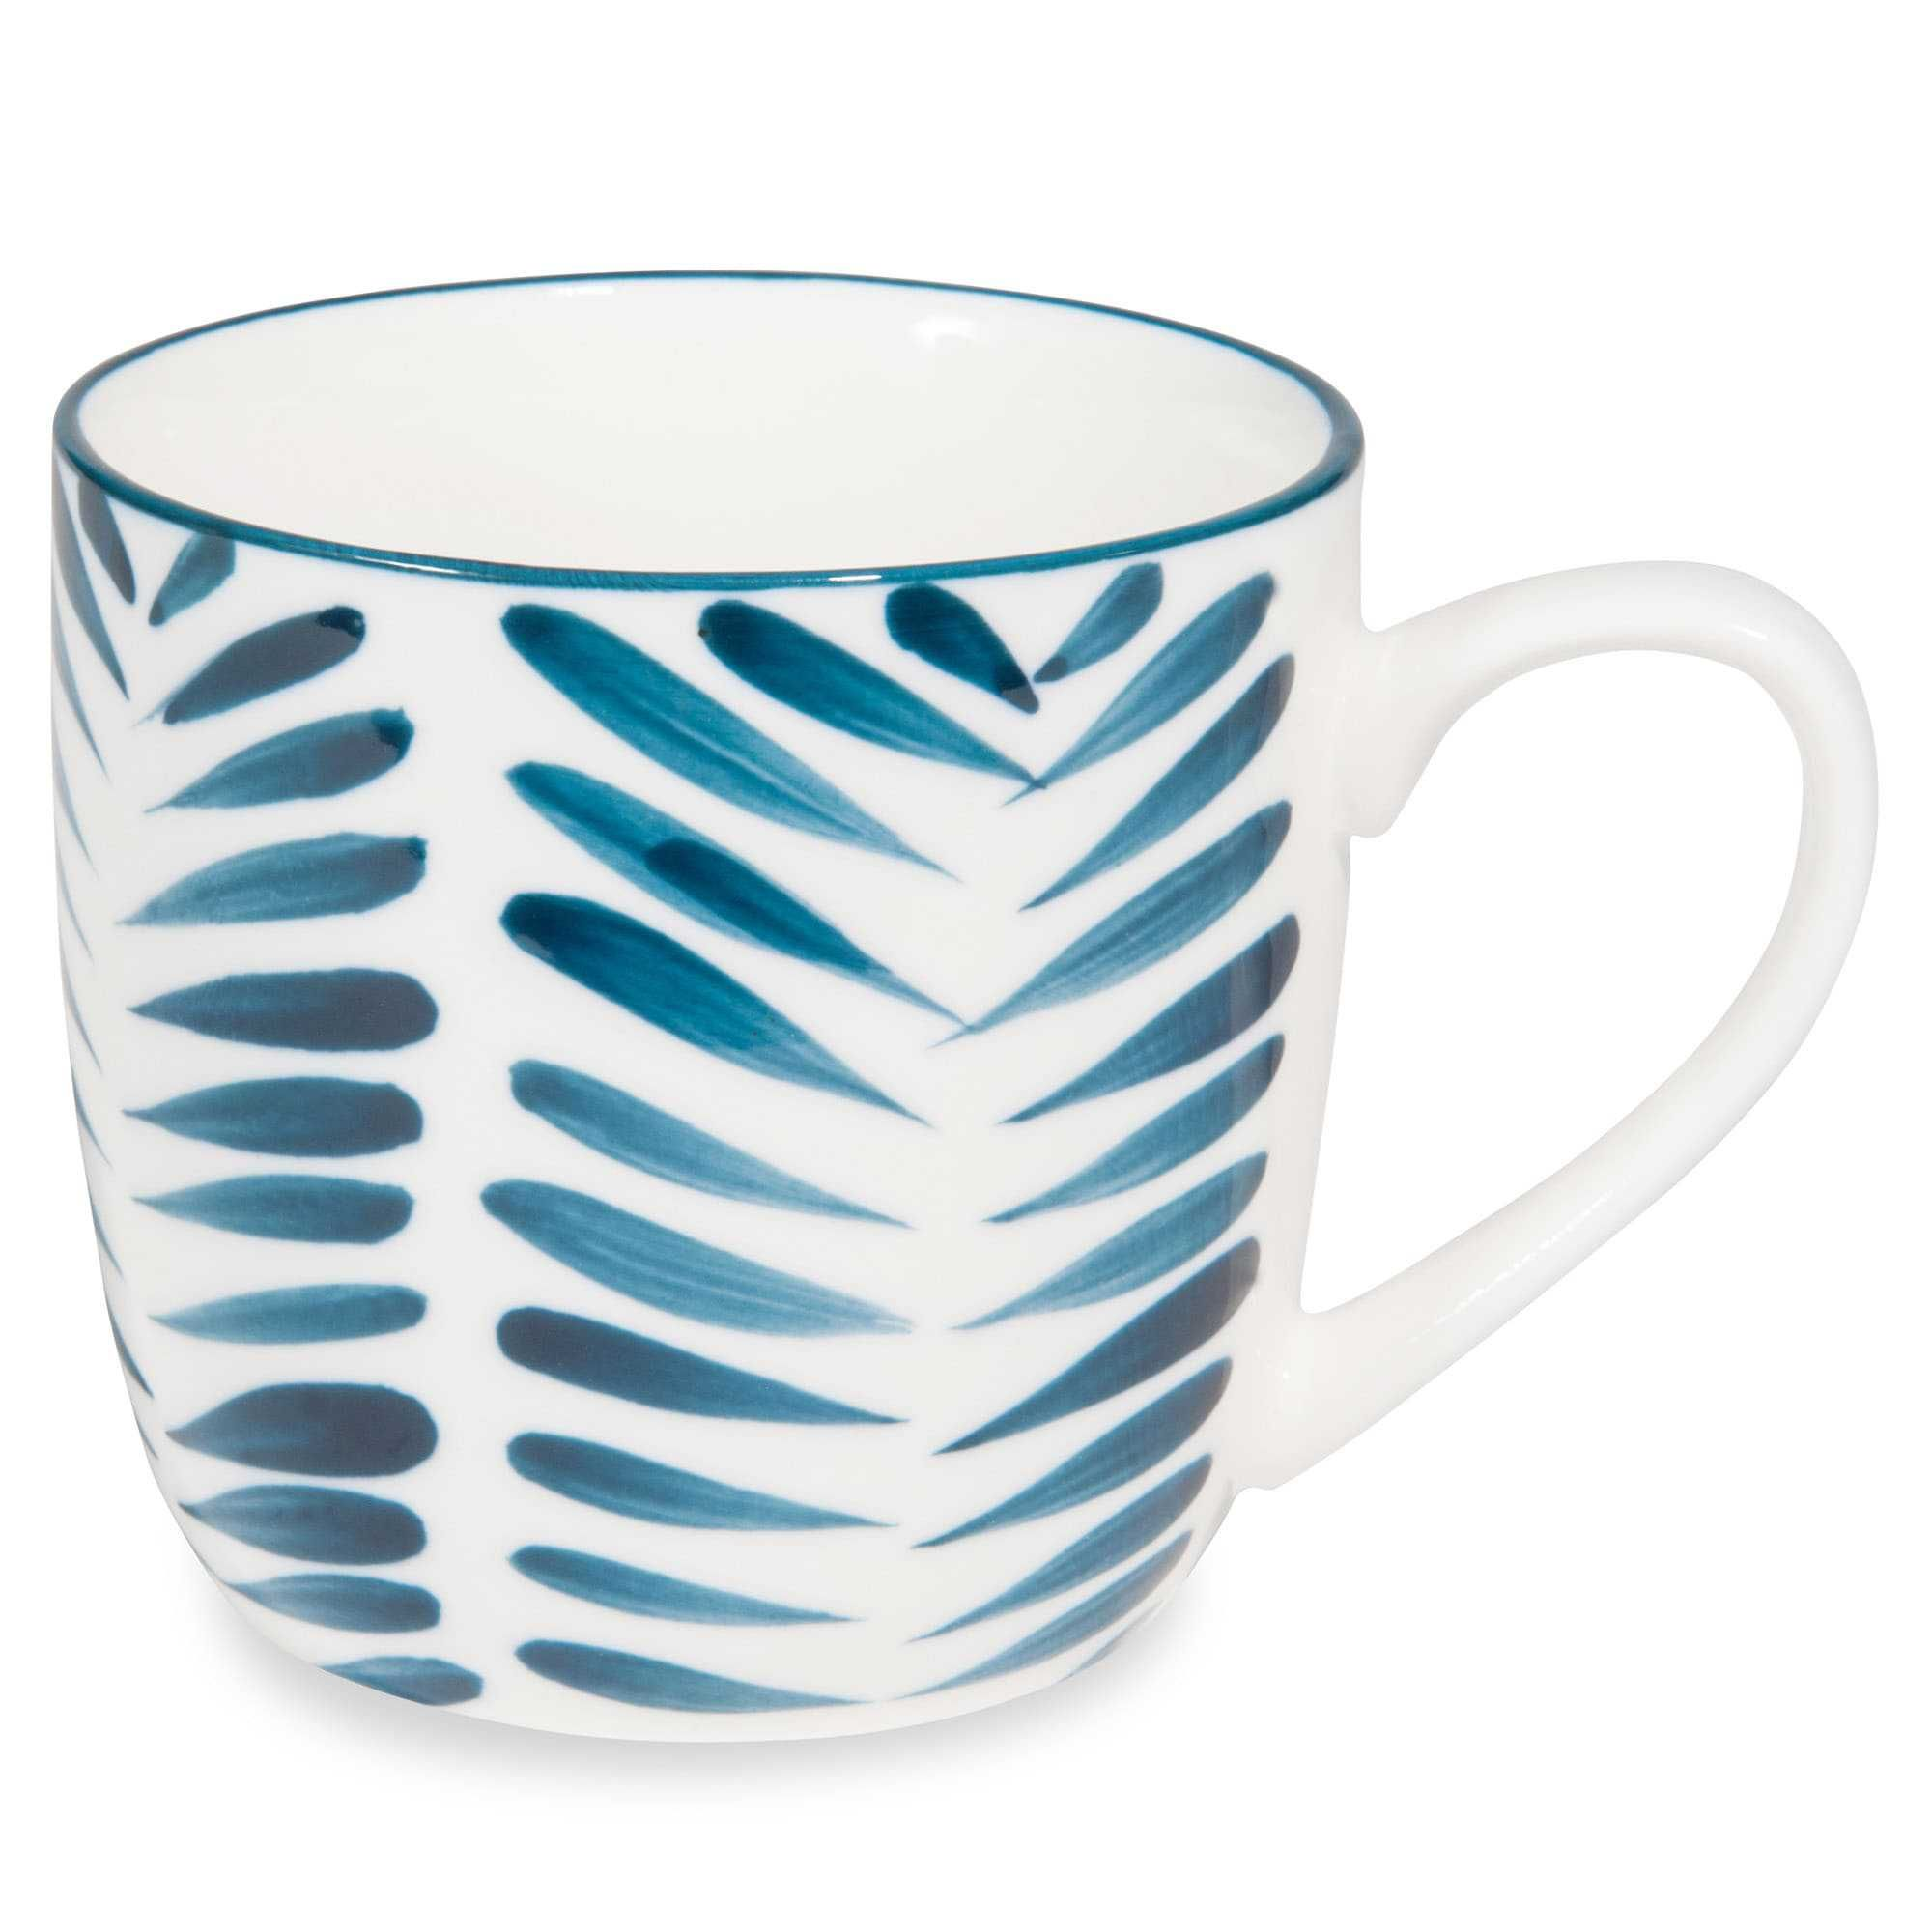 mug en porcelaine motifs feuilles bleues escale lot de 2 mug pinterest porcelaine. Black Bedroom Furniture Sets. Home Design Ideas